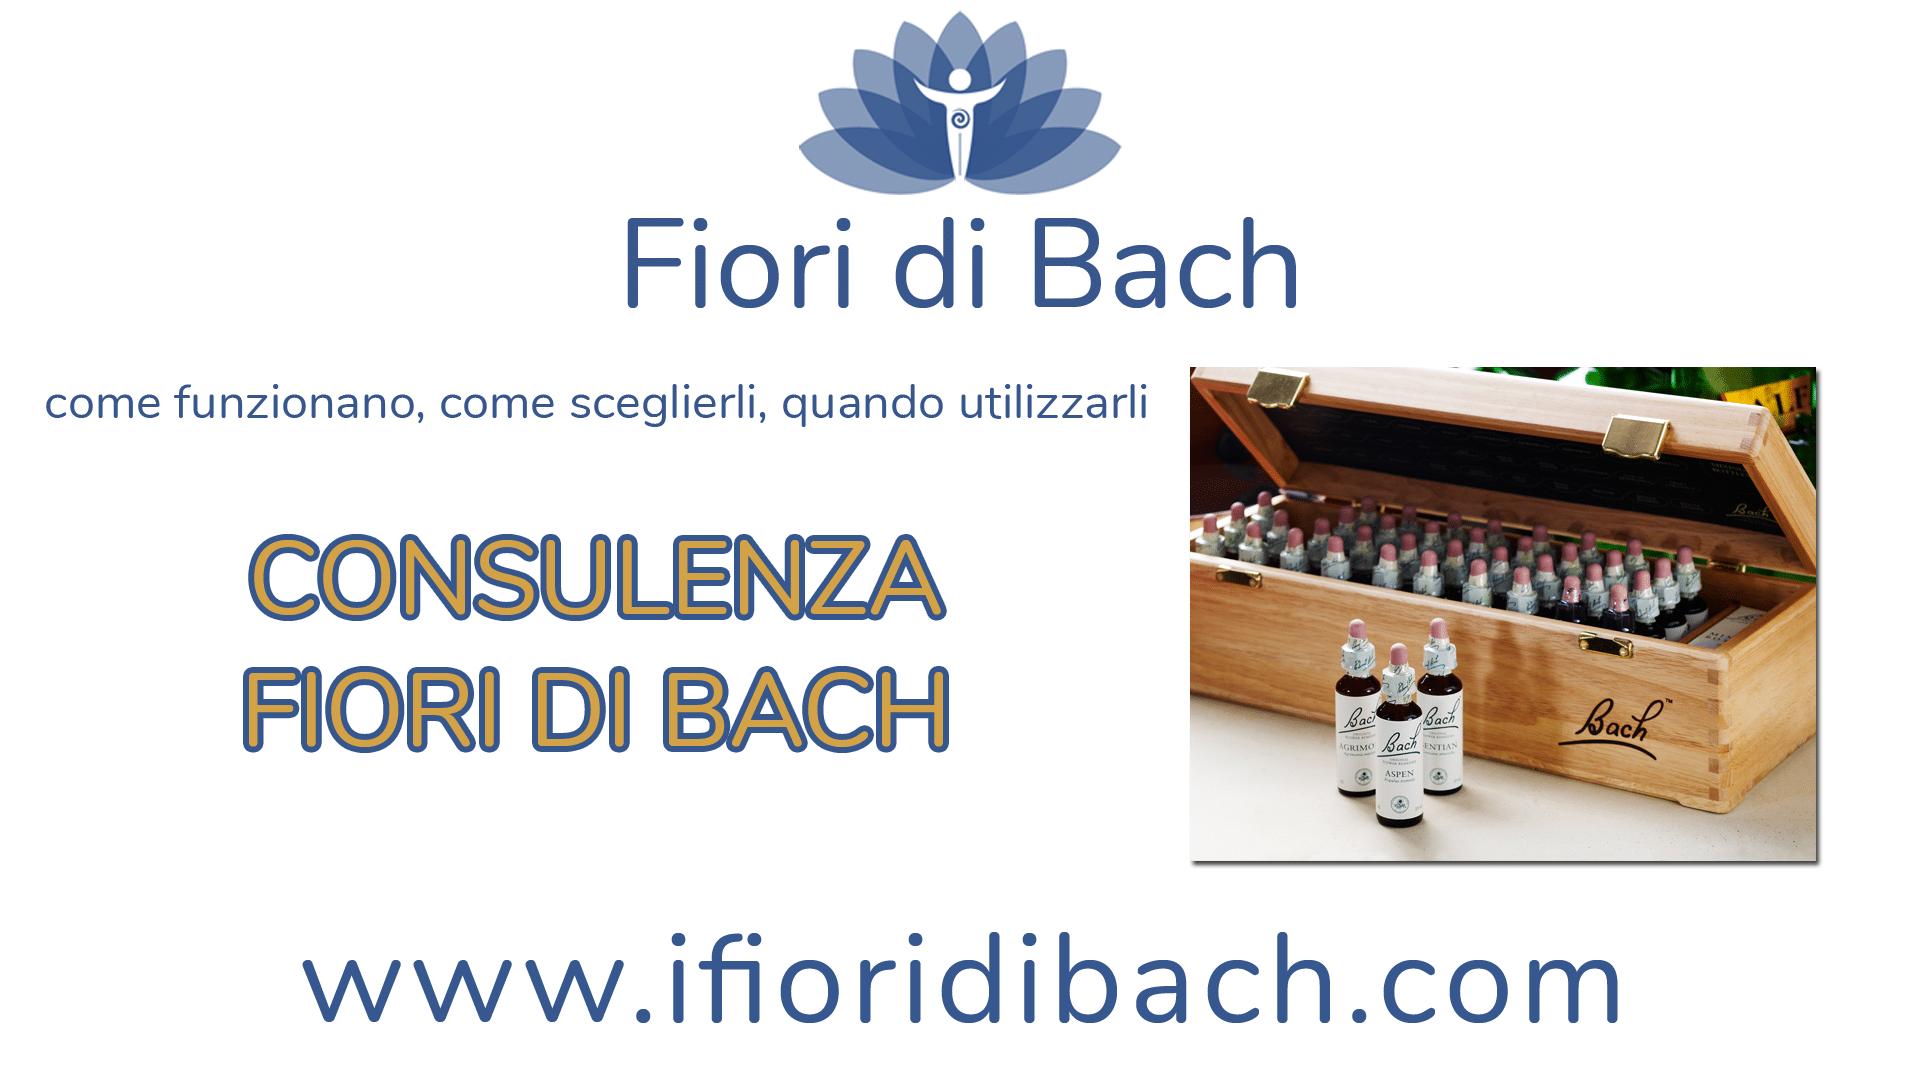 Consulenza fiori di Bach